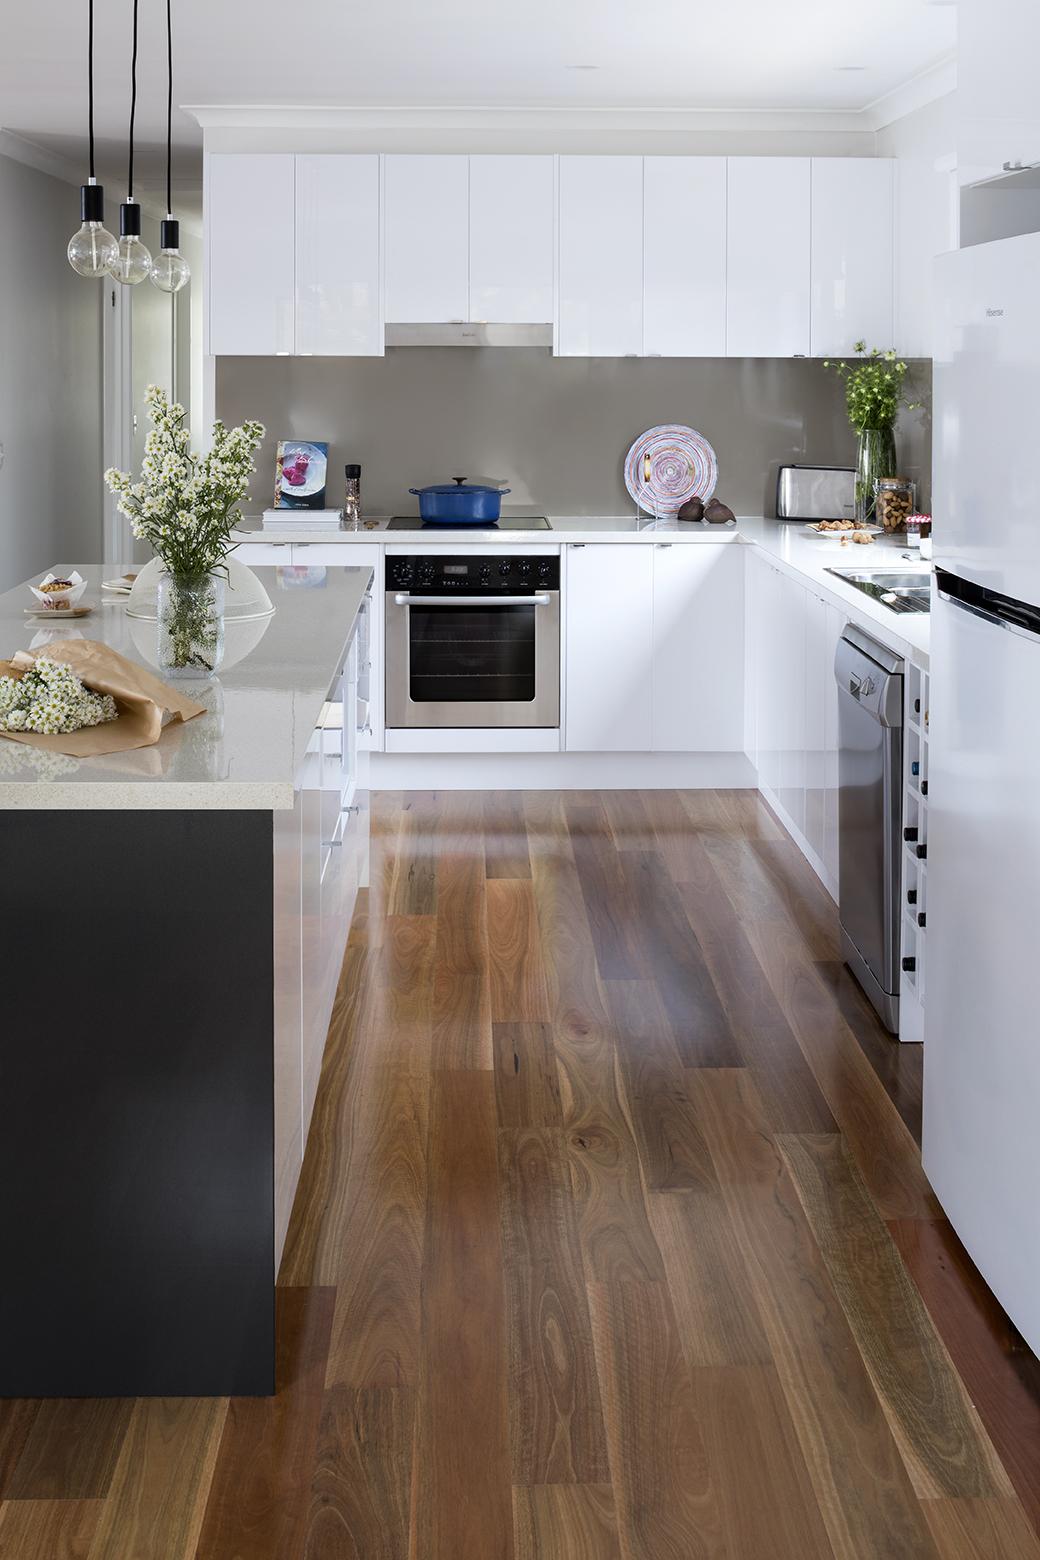 Coastal Getaway Kitchen Inspiration And Ideas Kaboodle